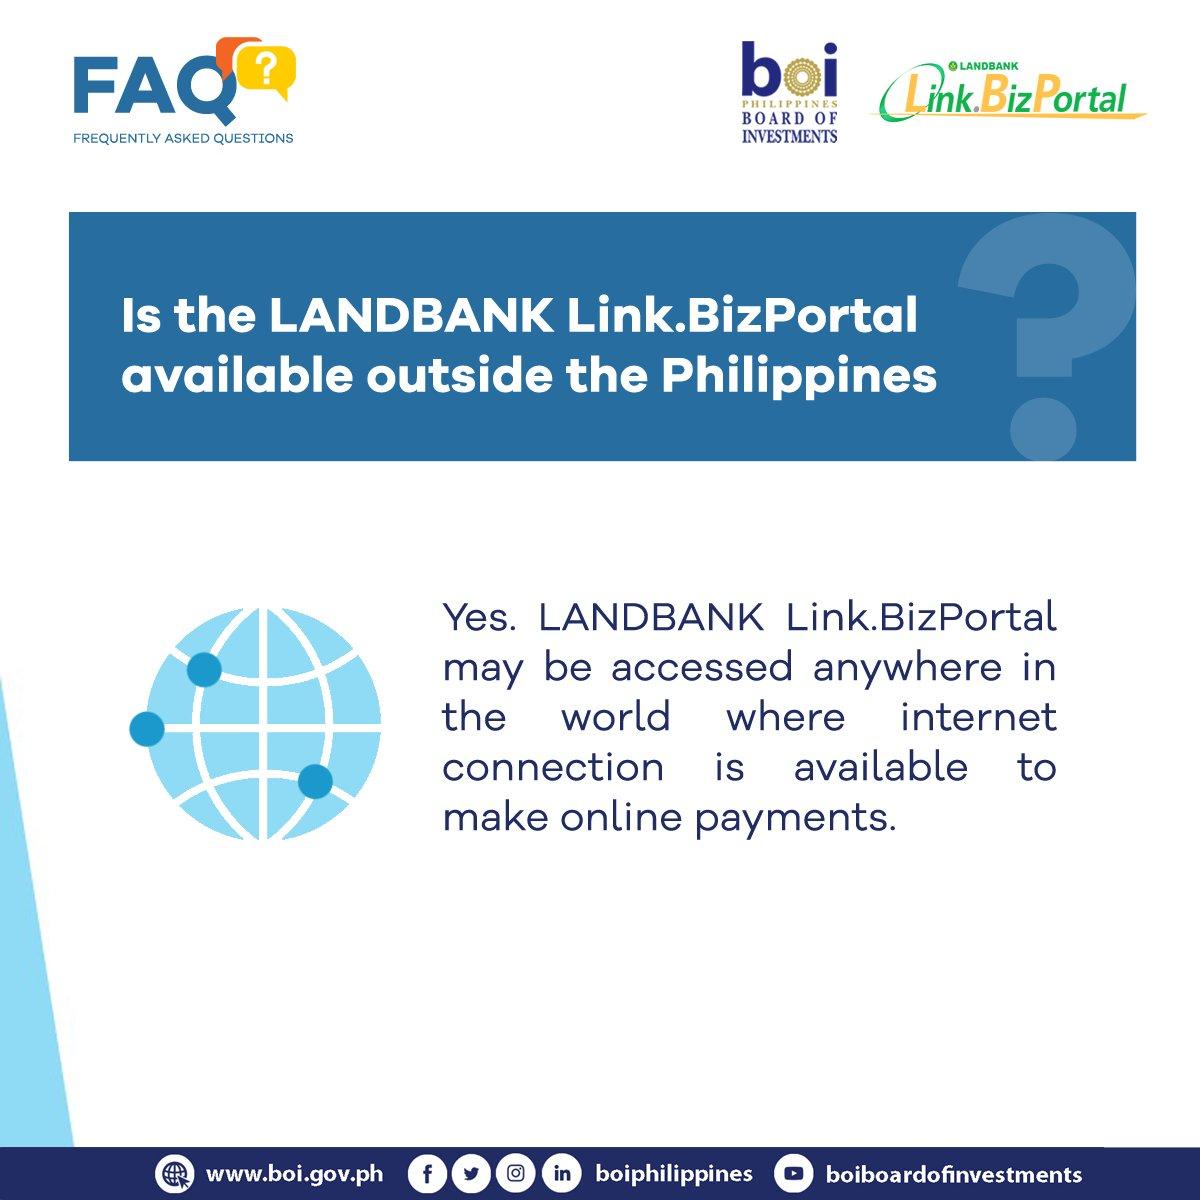 Invest philippines gov ph edinburgh development and investment limited partner